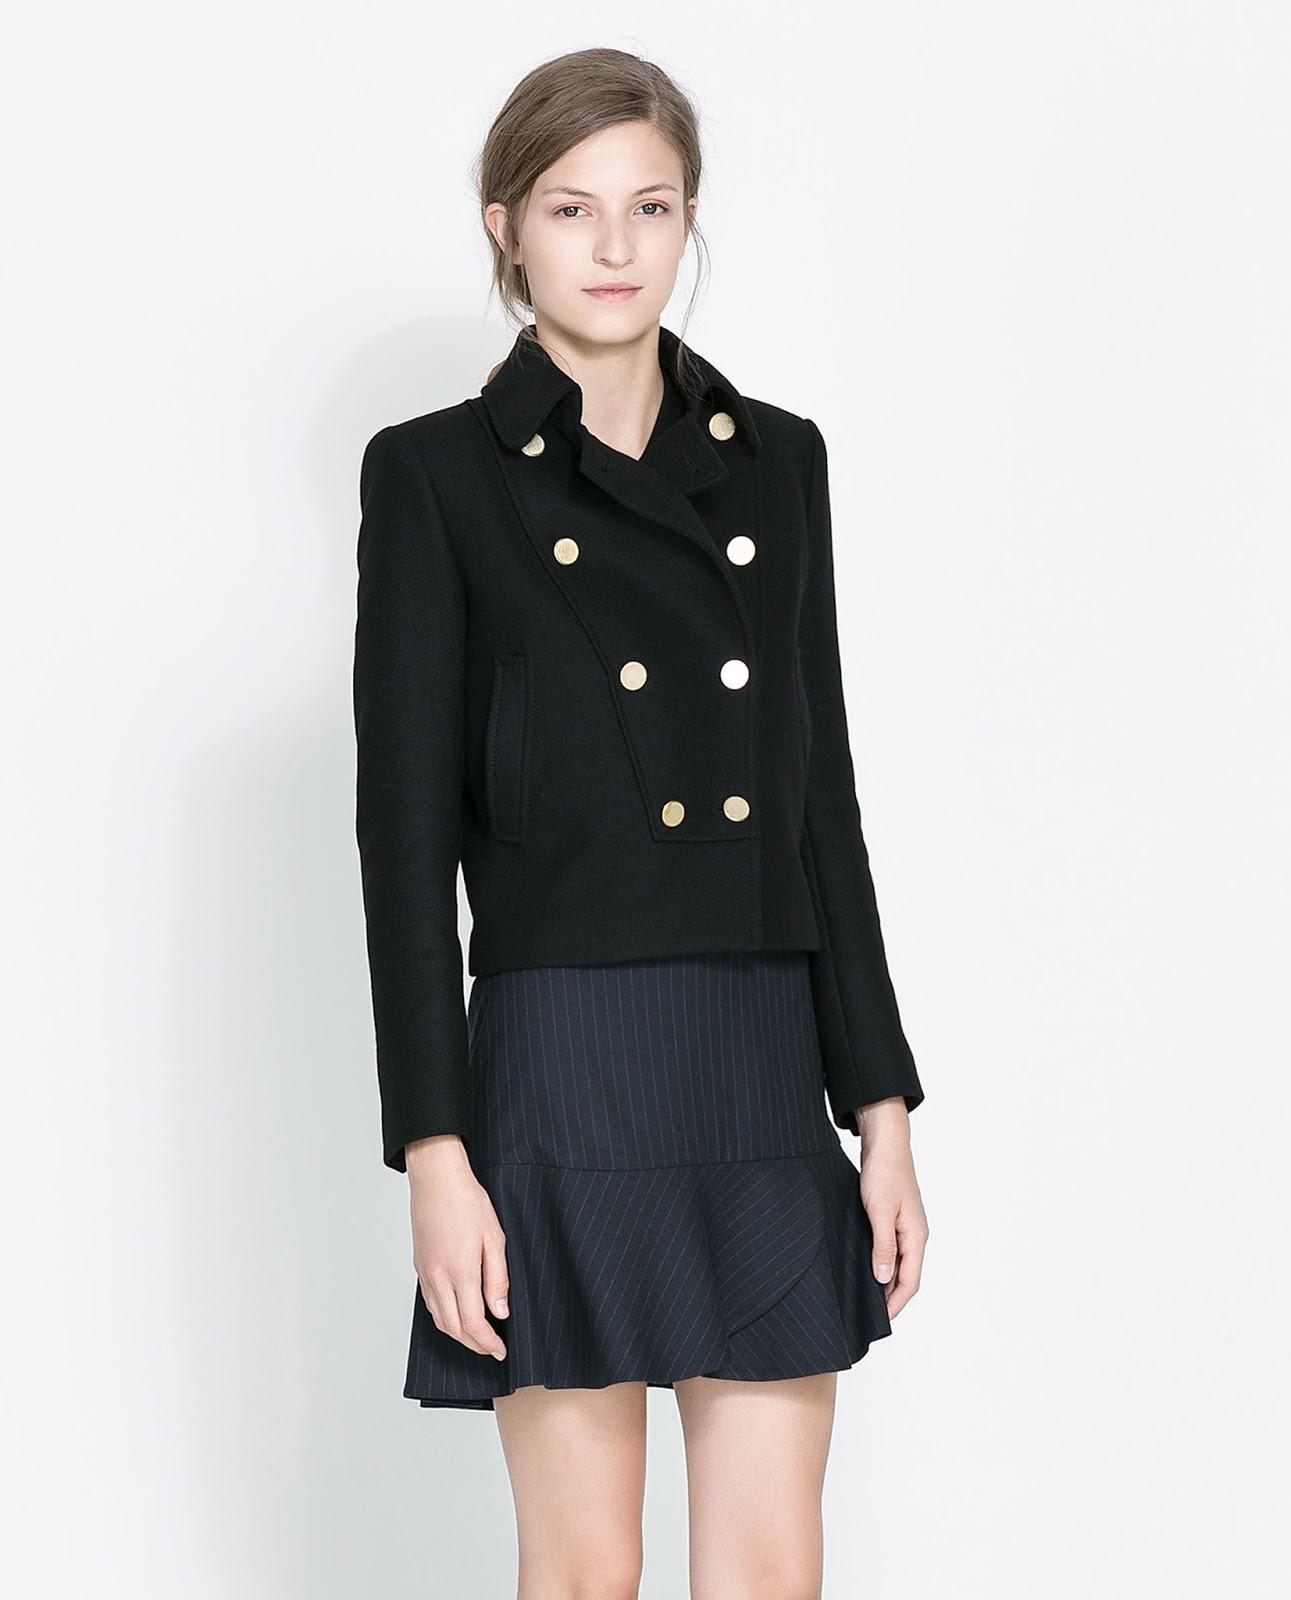 db773ca15e6 Zara Leopard Print Dress Uk - Data Dynamic AG